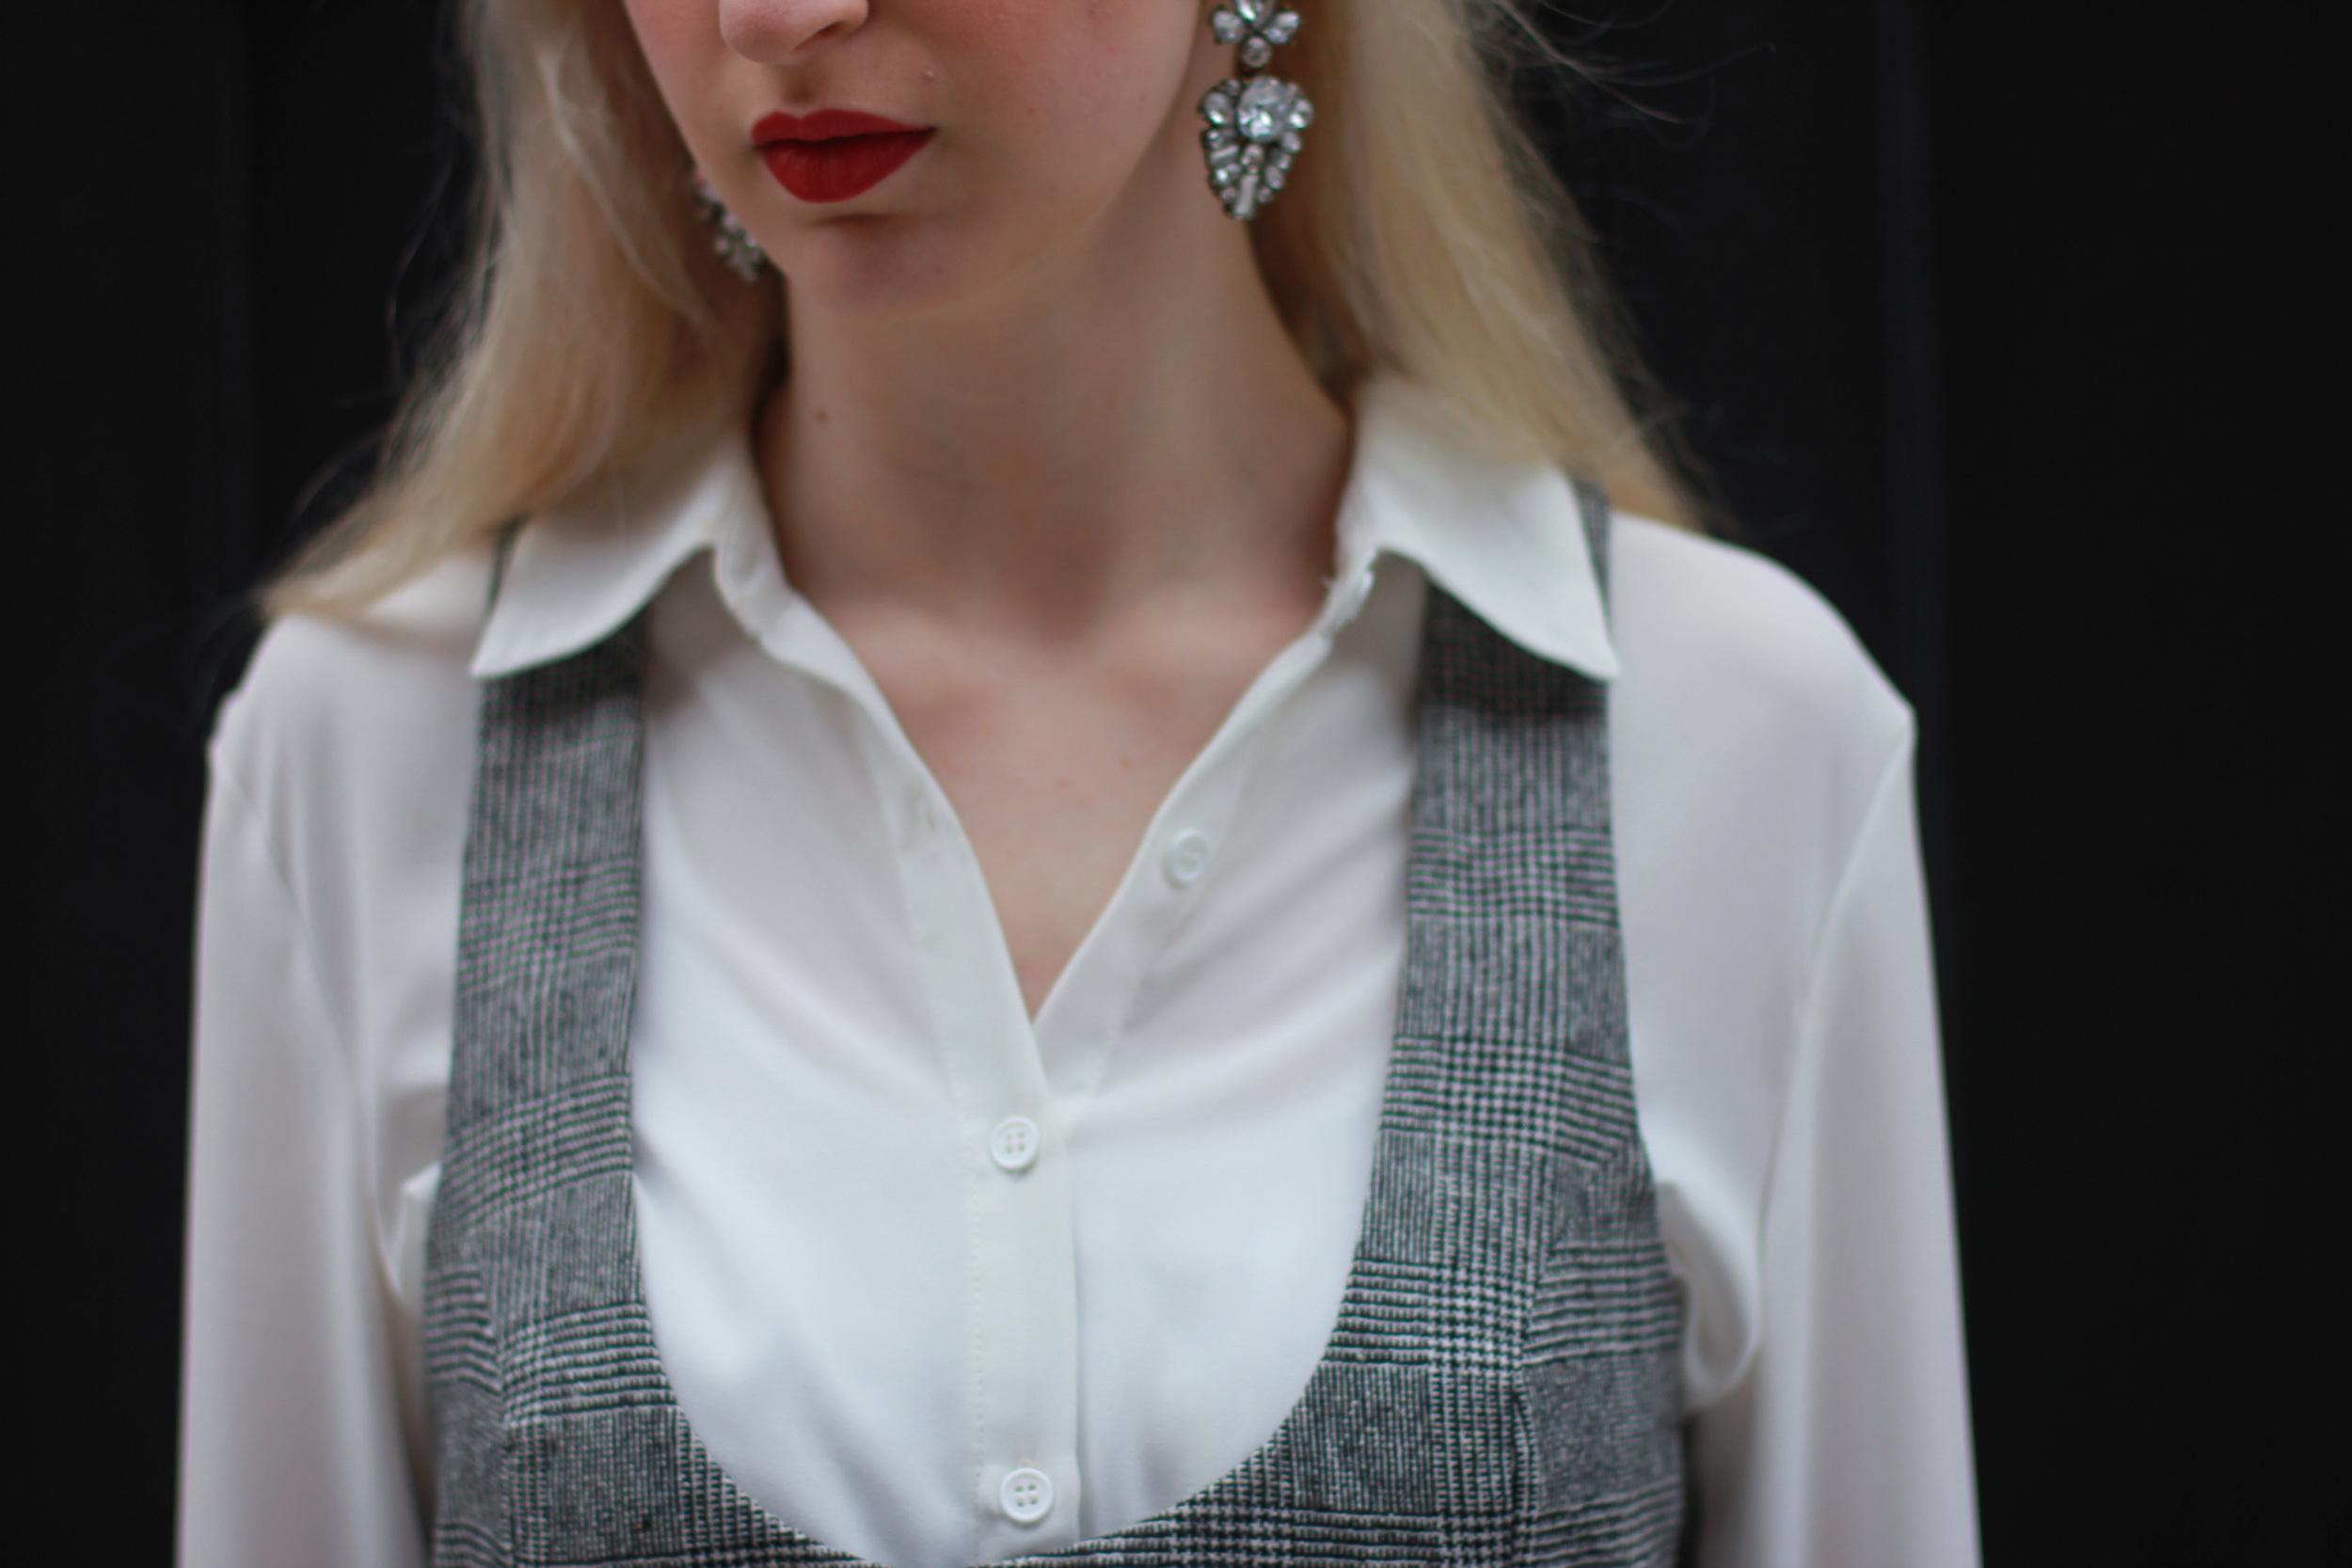 vintage dress, Forever21 white chiffon button down, black elastic ankle strap ballet flats, nars matte lip pencil in cruella, baublebar statement earrings